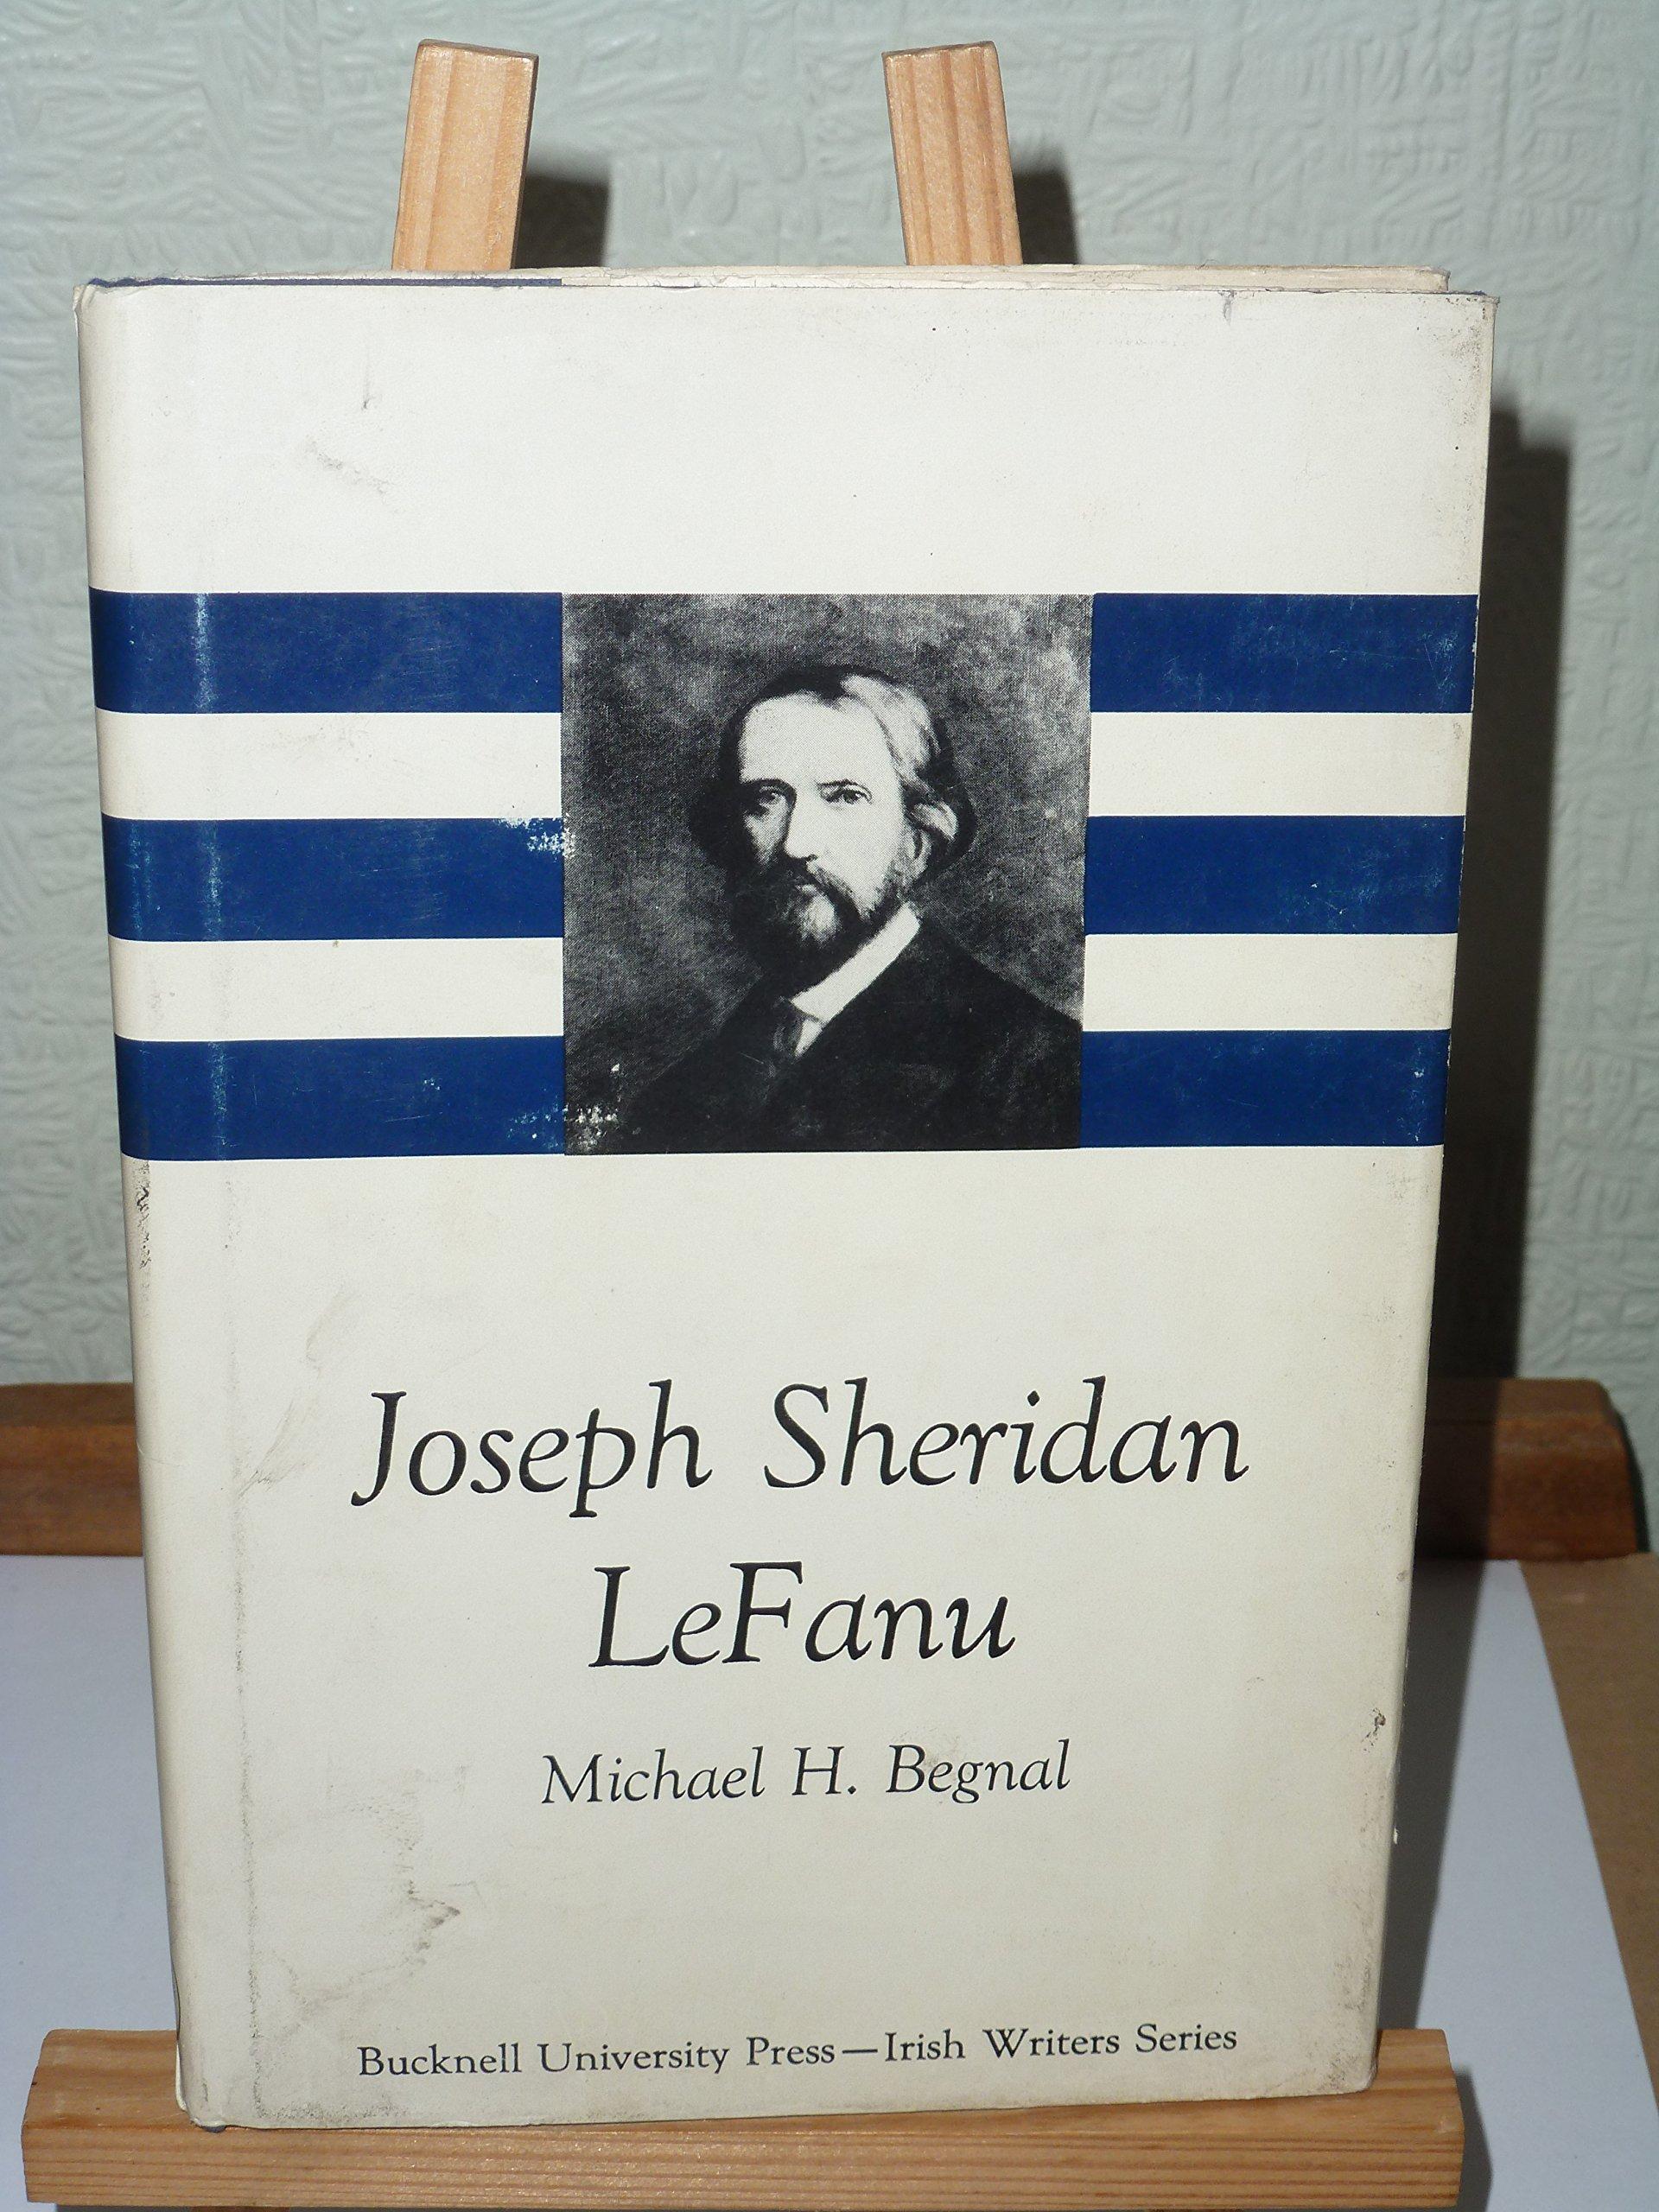 Joseph Sheridan Lefanu (The Irish writers series)